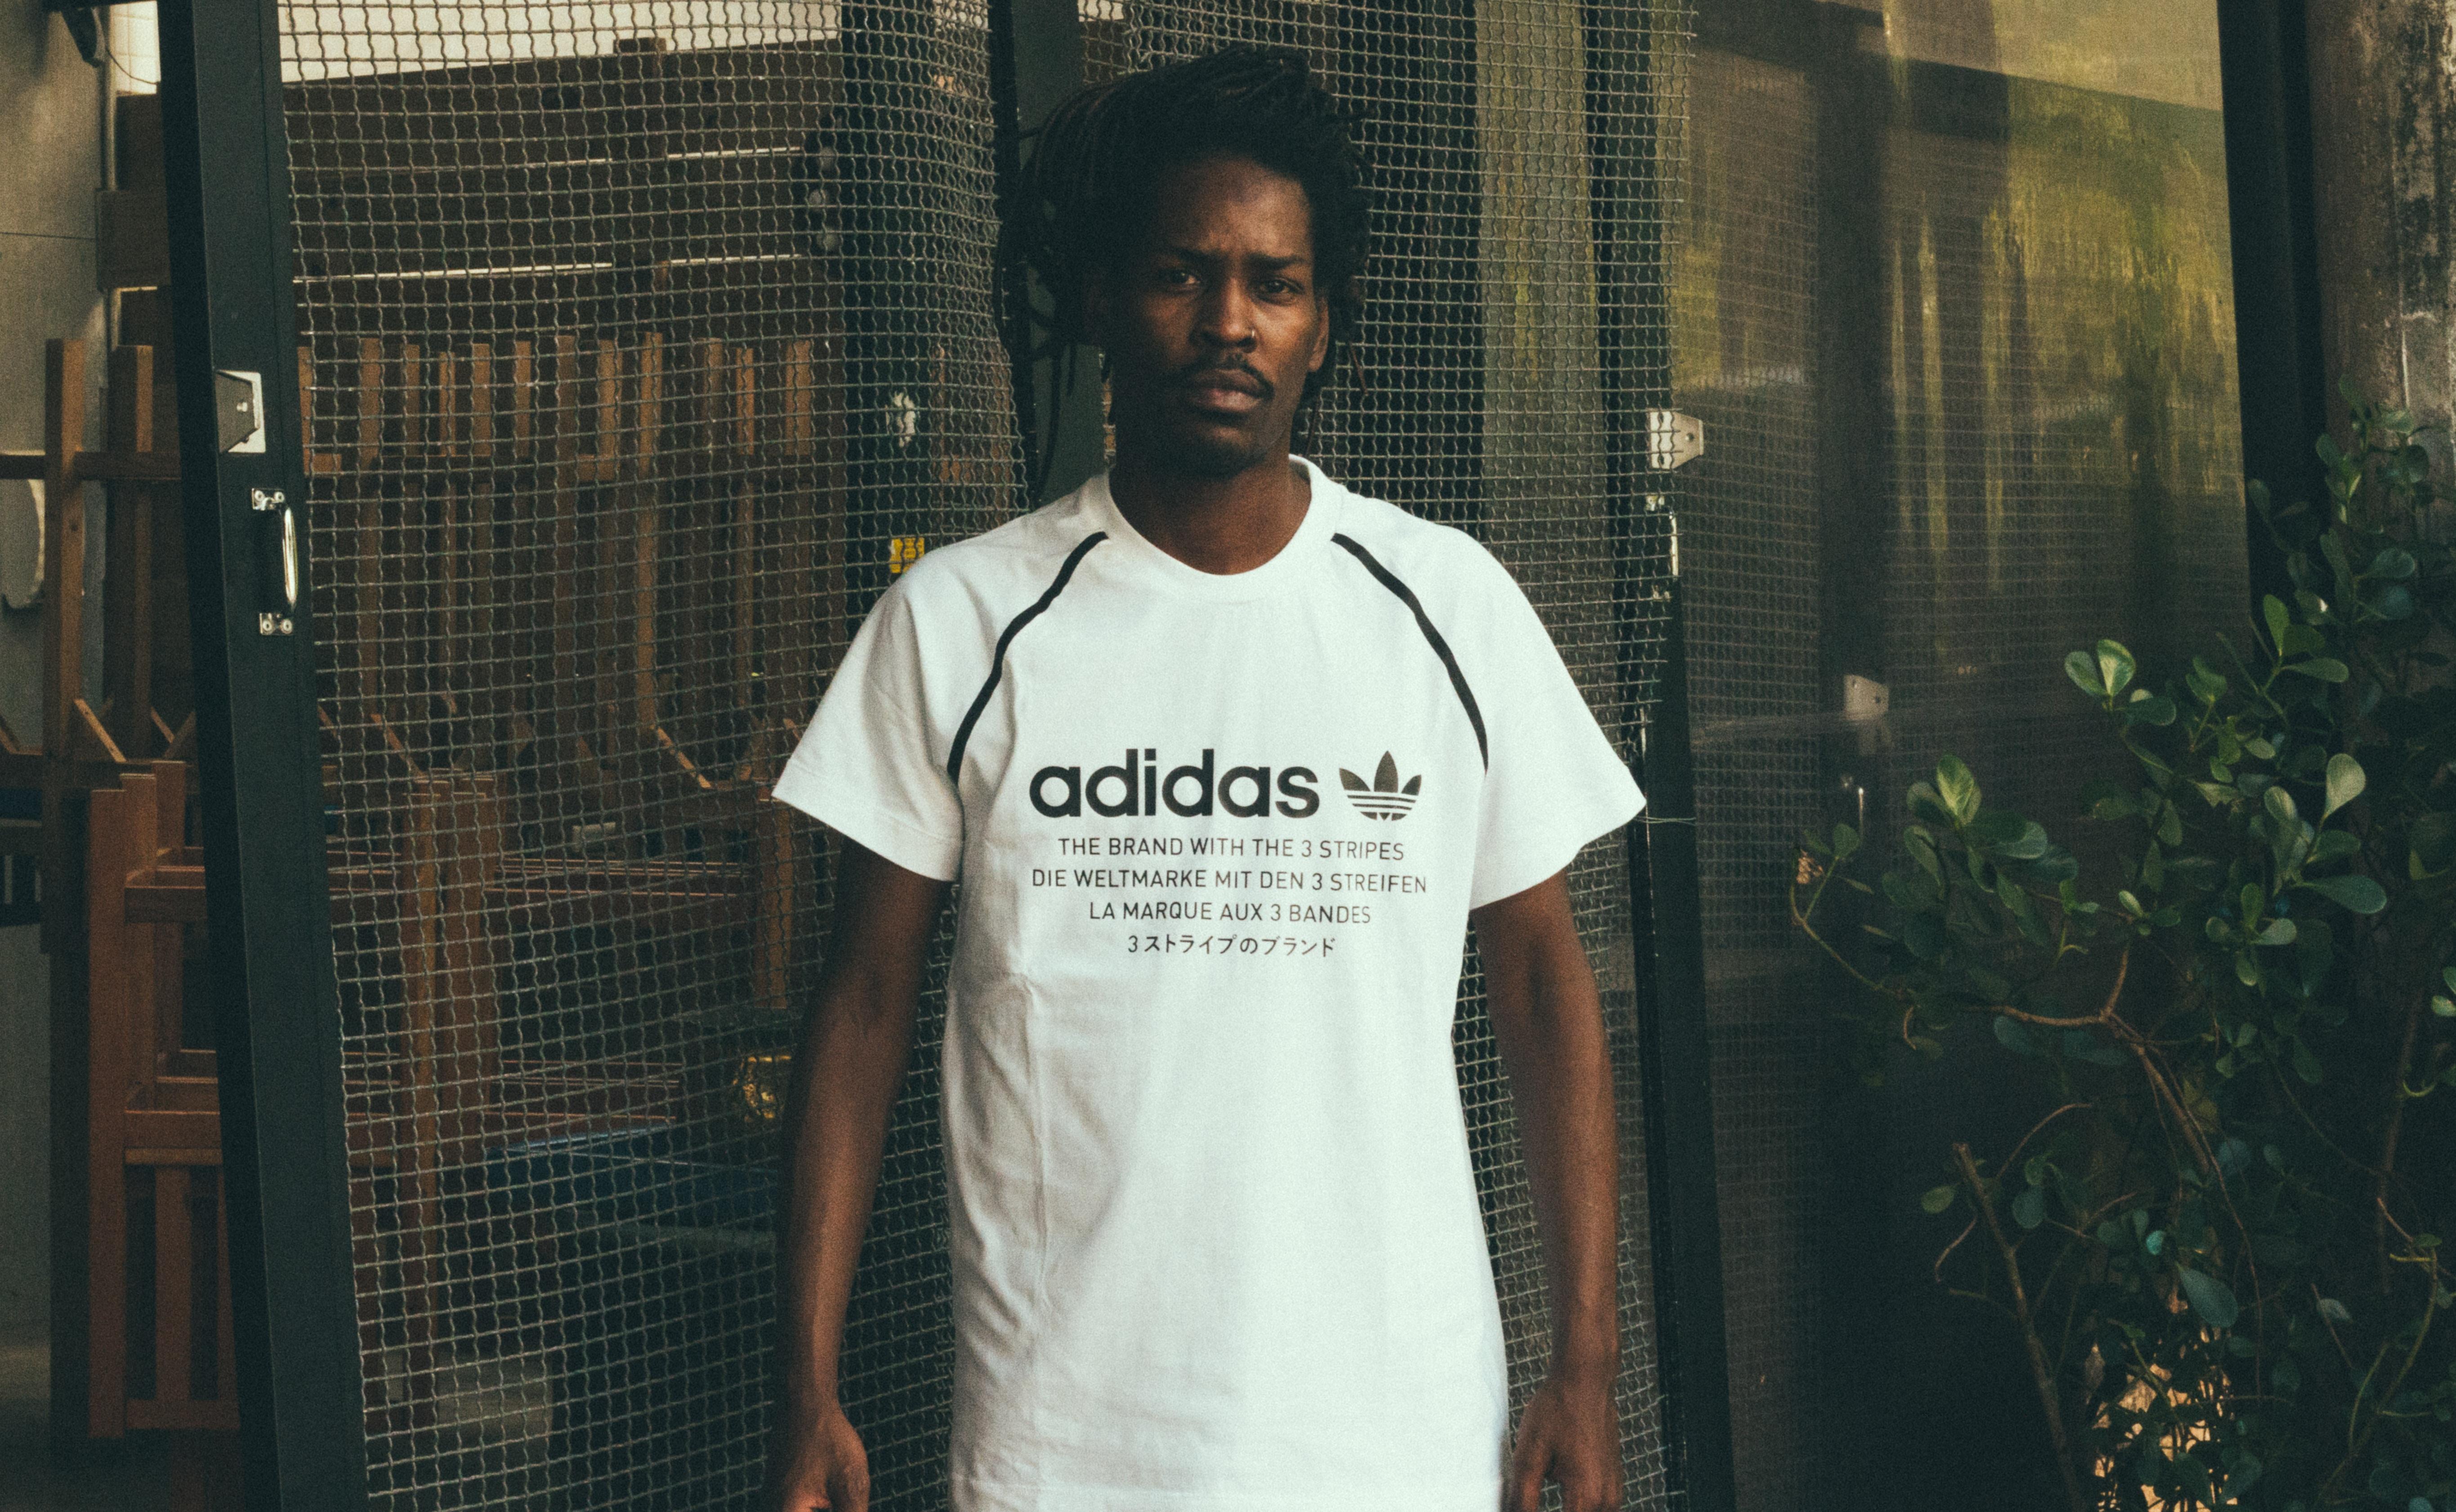 man wearing white and black adidas crew-neck t-shirt